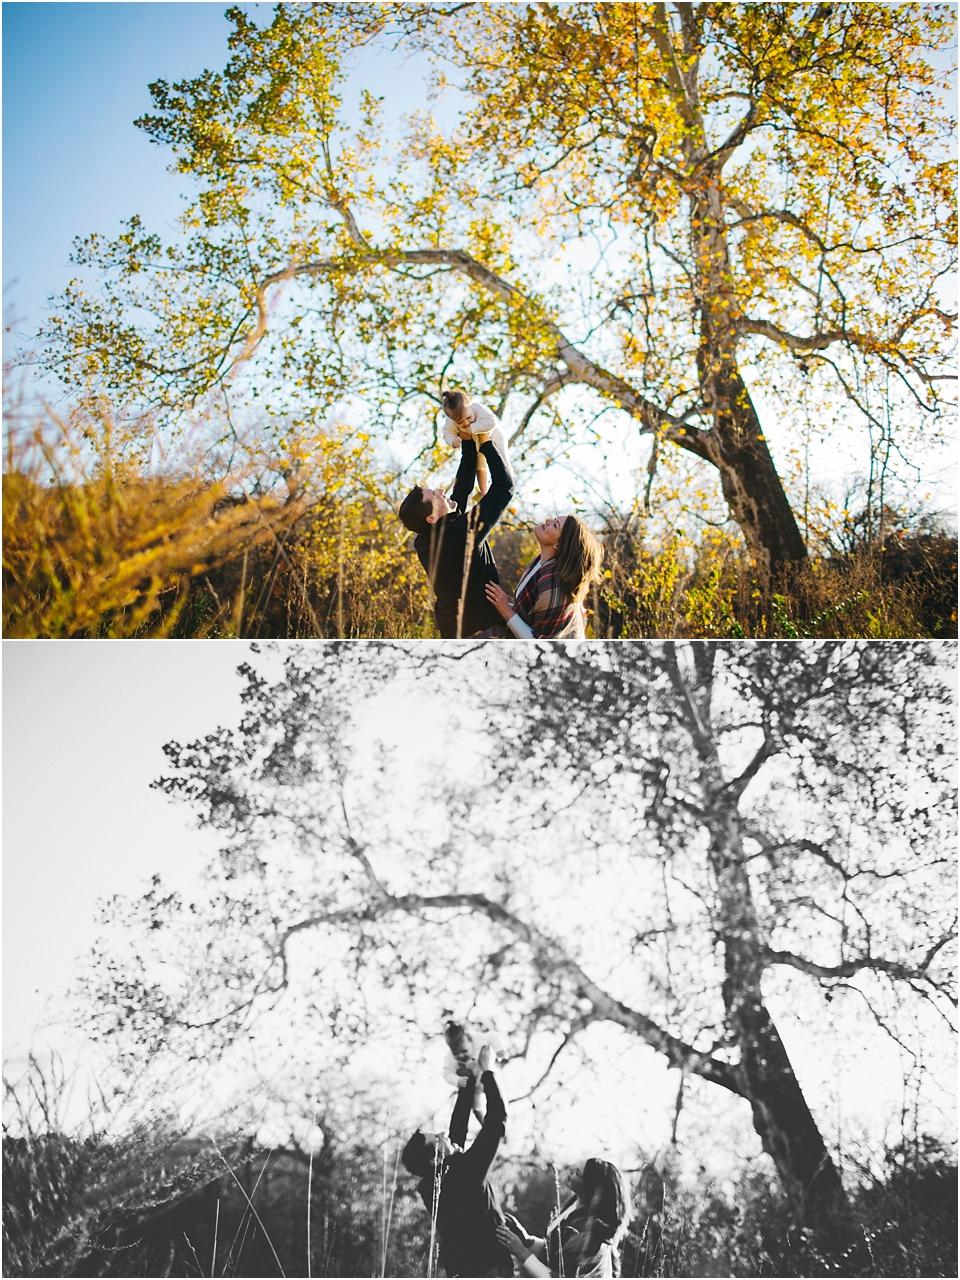 kansascityfamilyphotographer_2023